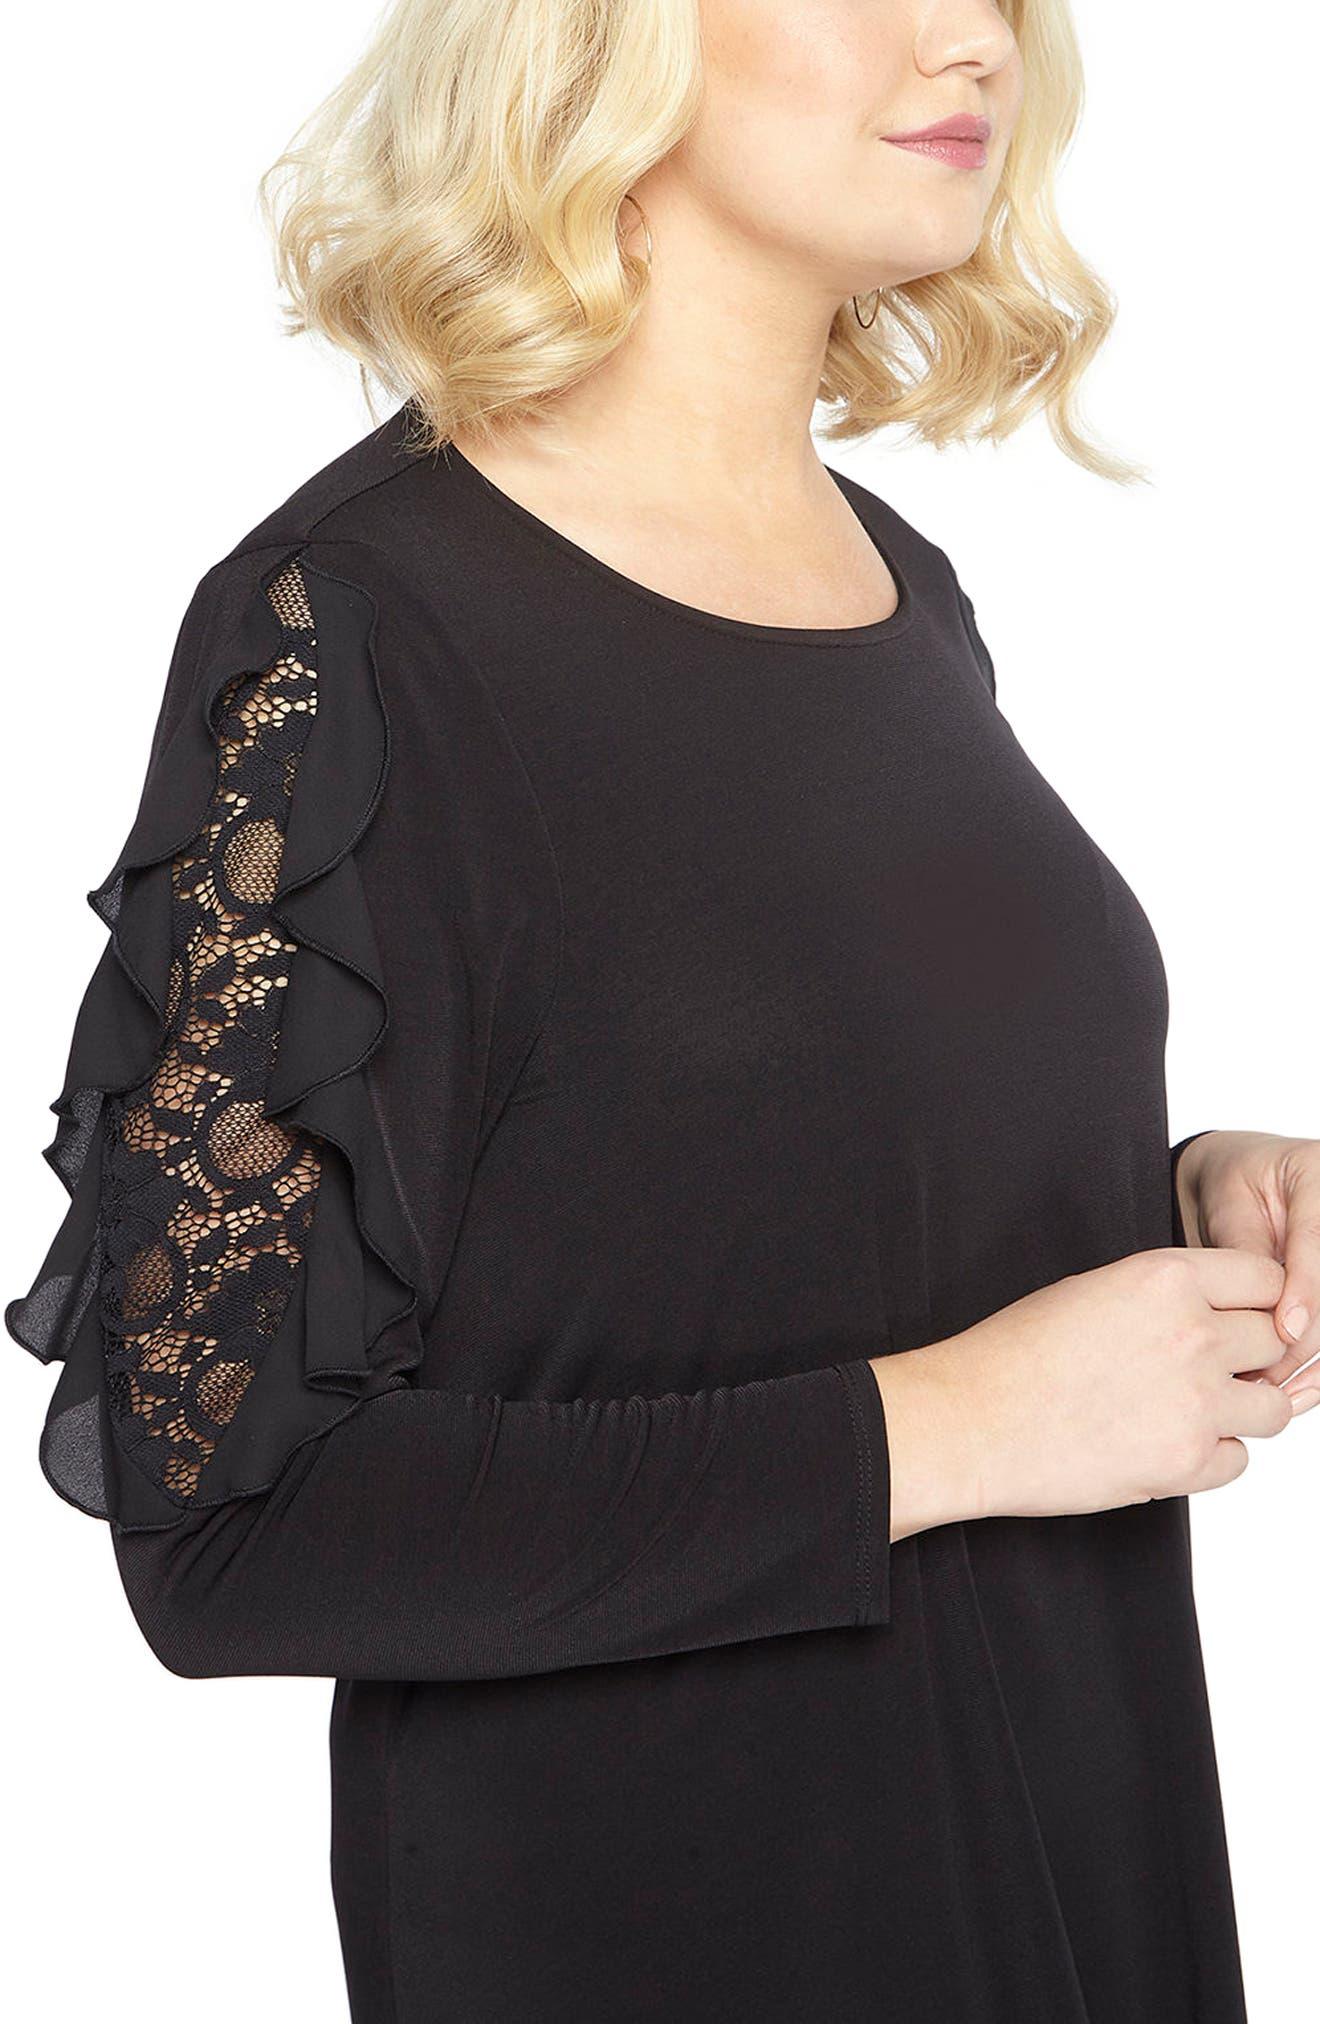 Lace Inset Shift Dress,                             Alternate thumbnail 4, color,                             Black